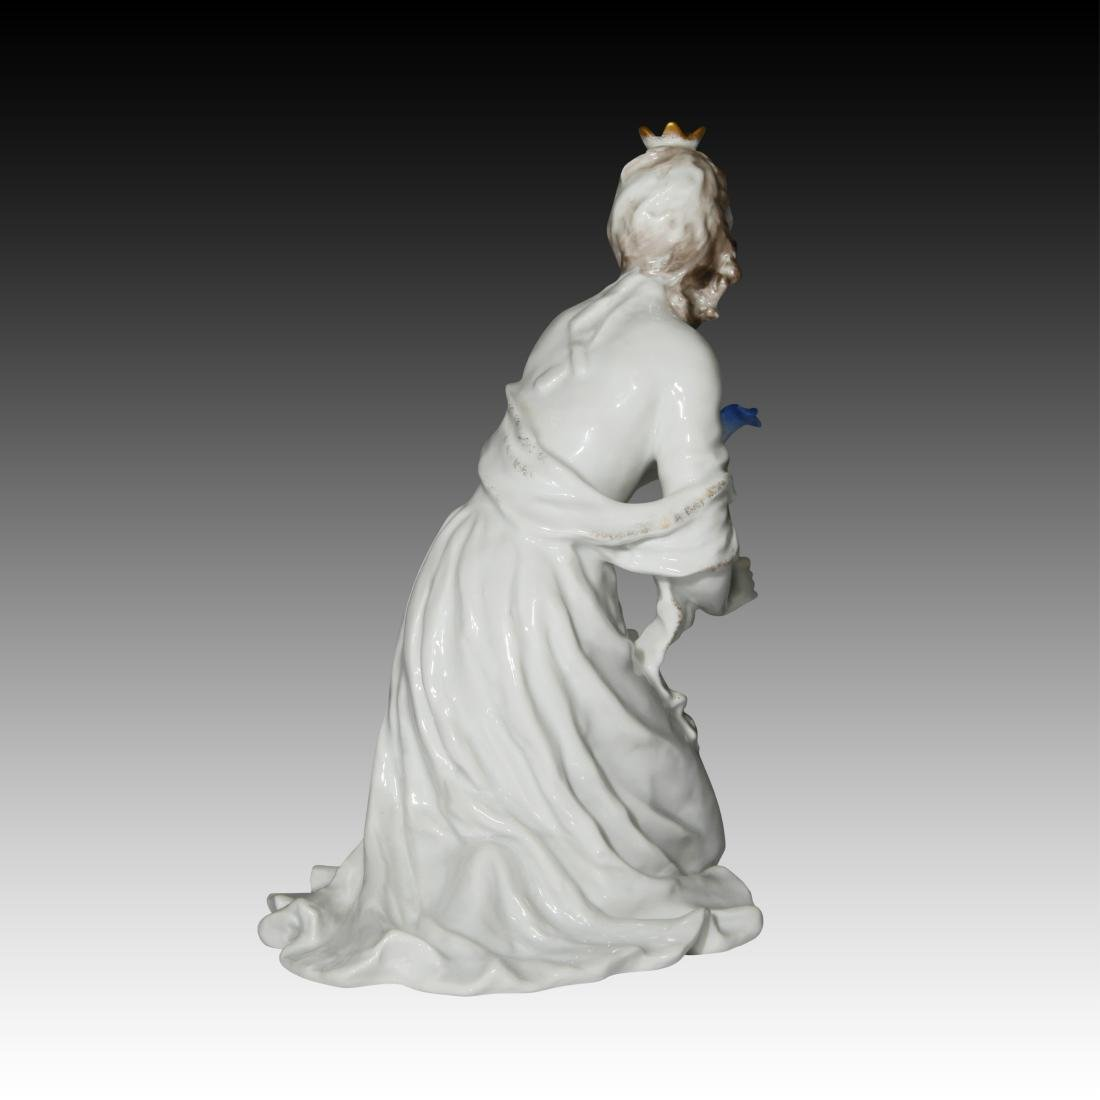 Rosenthal Figurine Princess with Flower # 7012 - 3